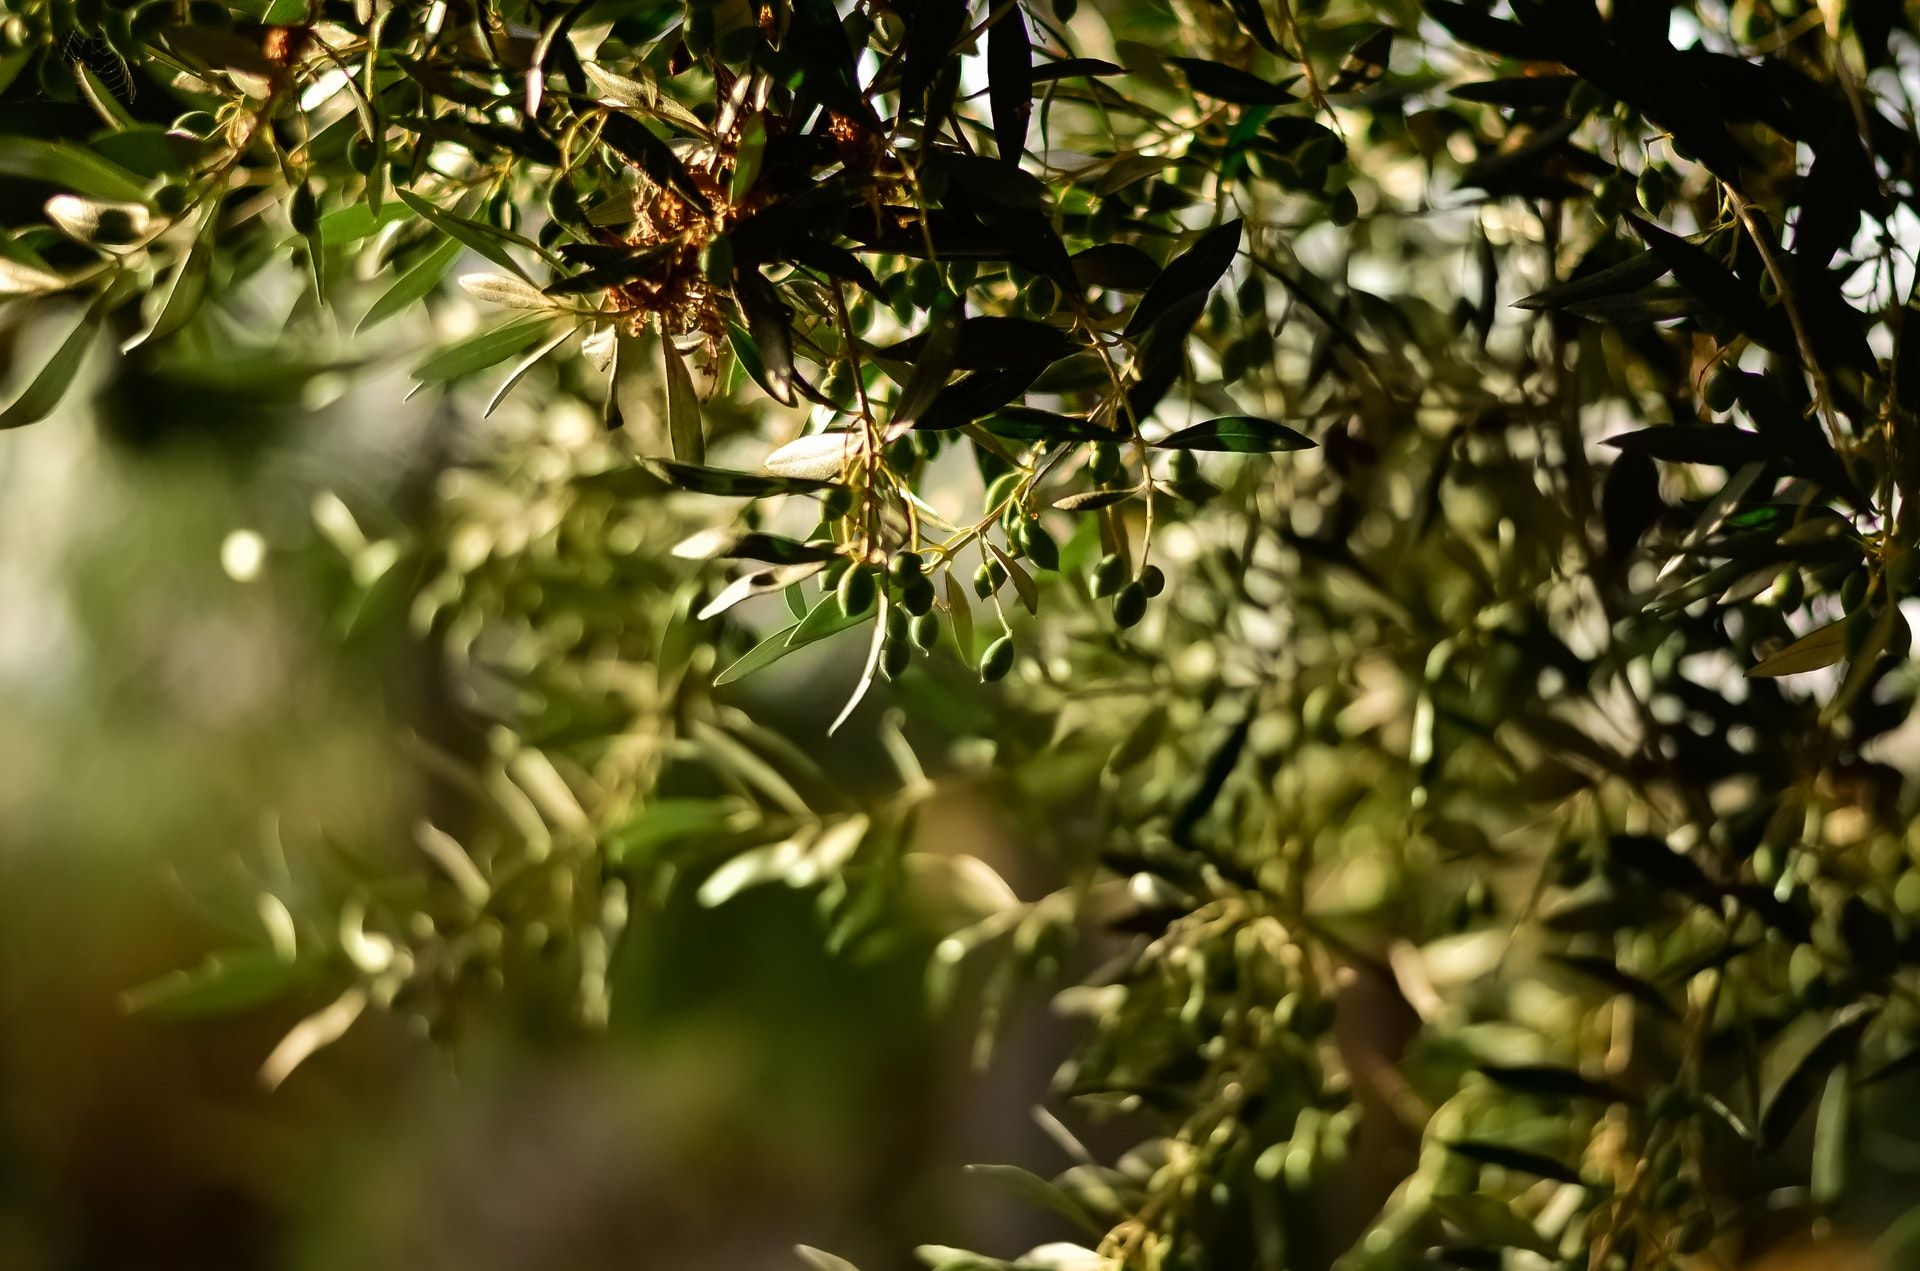 ¿Cuáles son las aceitunas Malagueñas más destacadas?